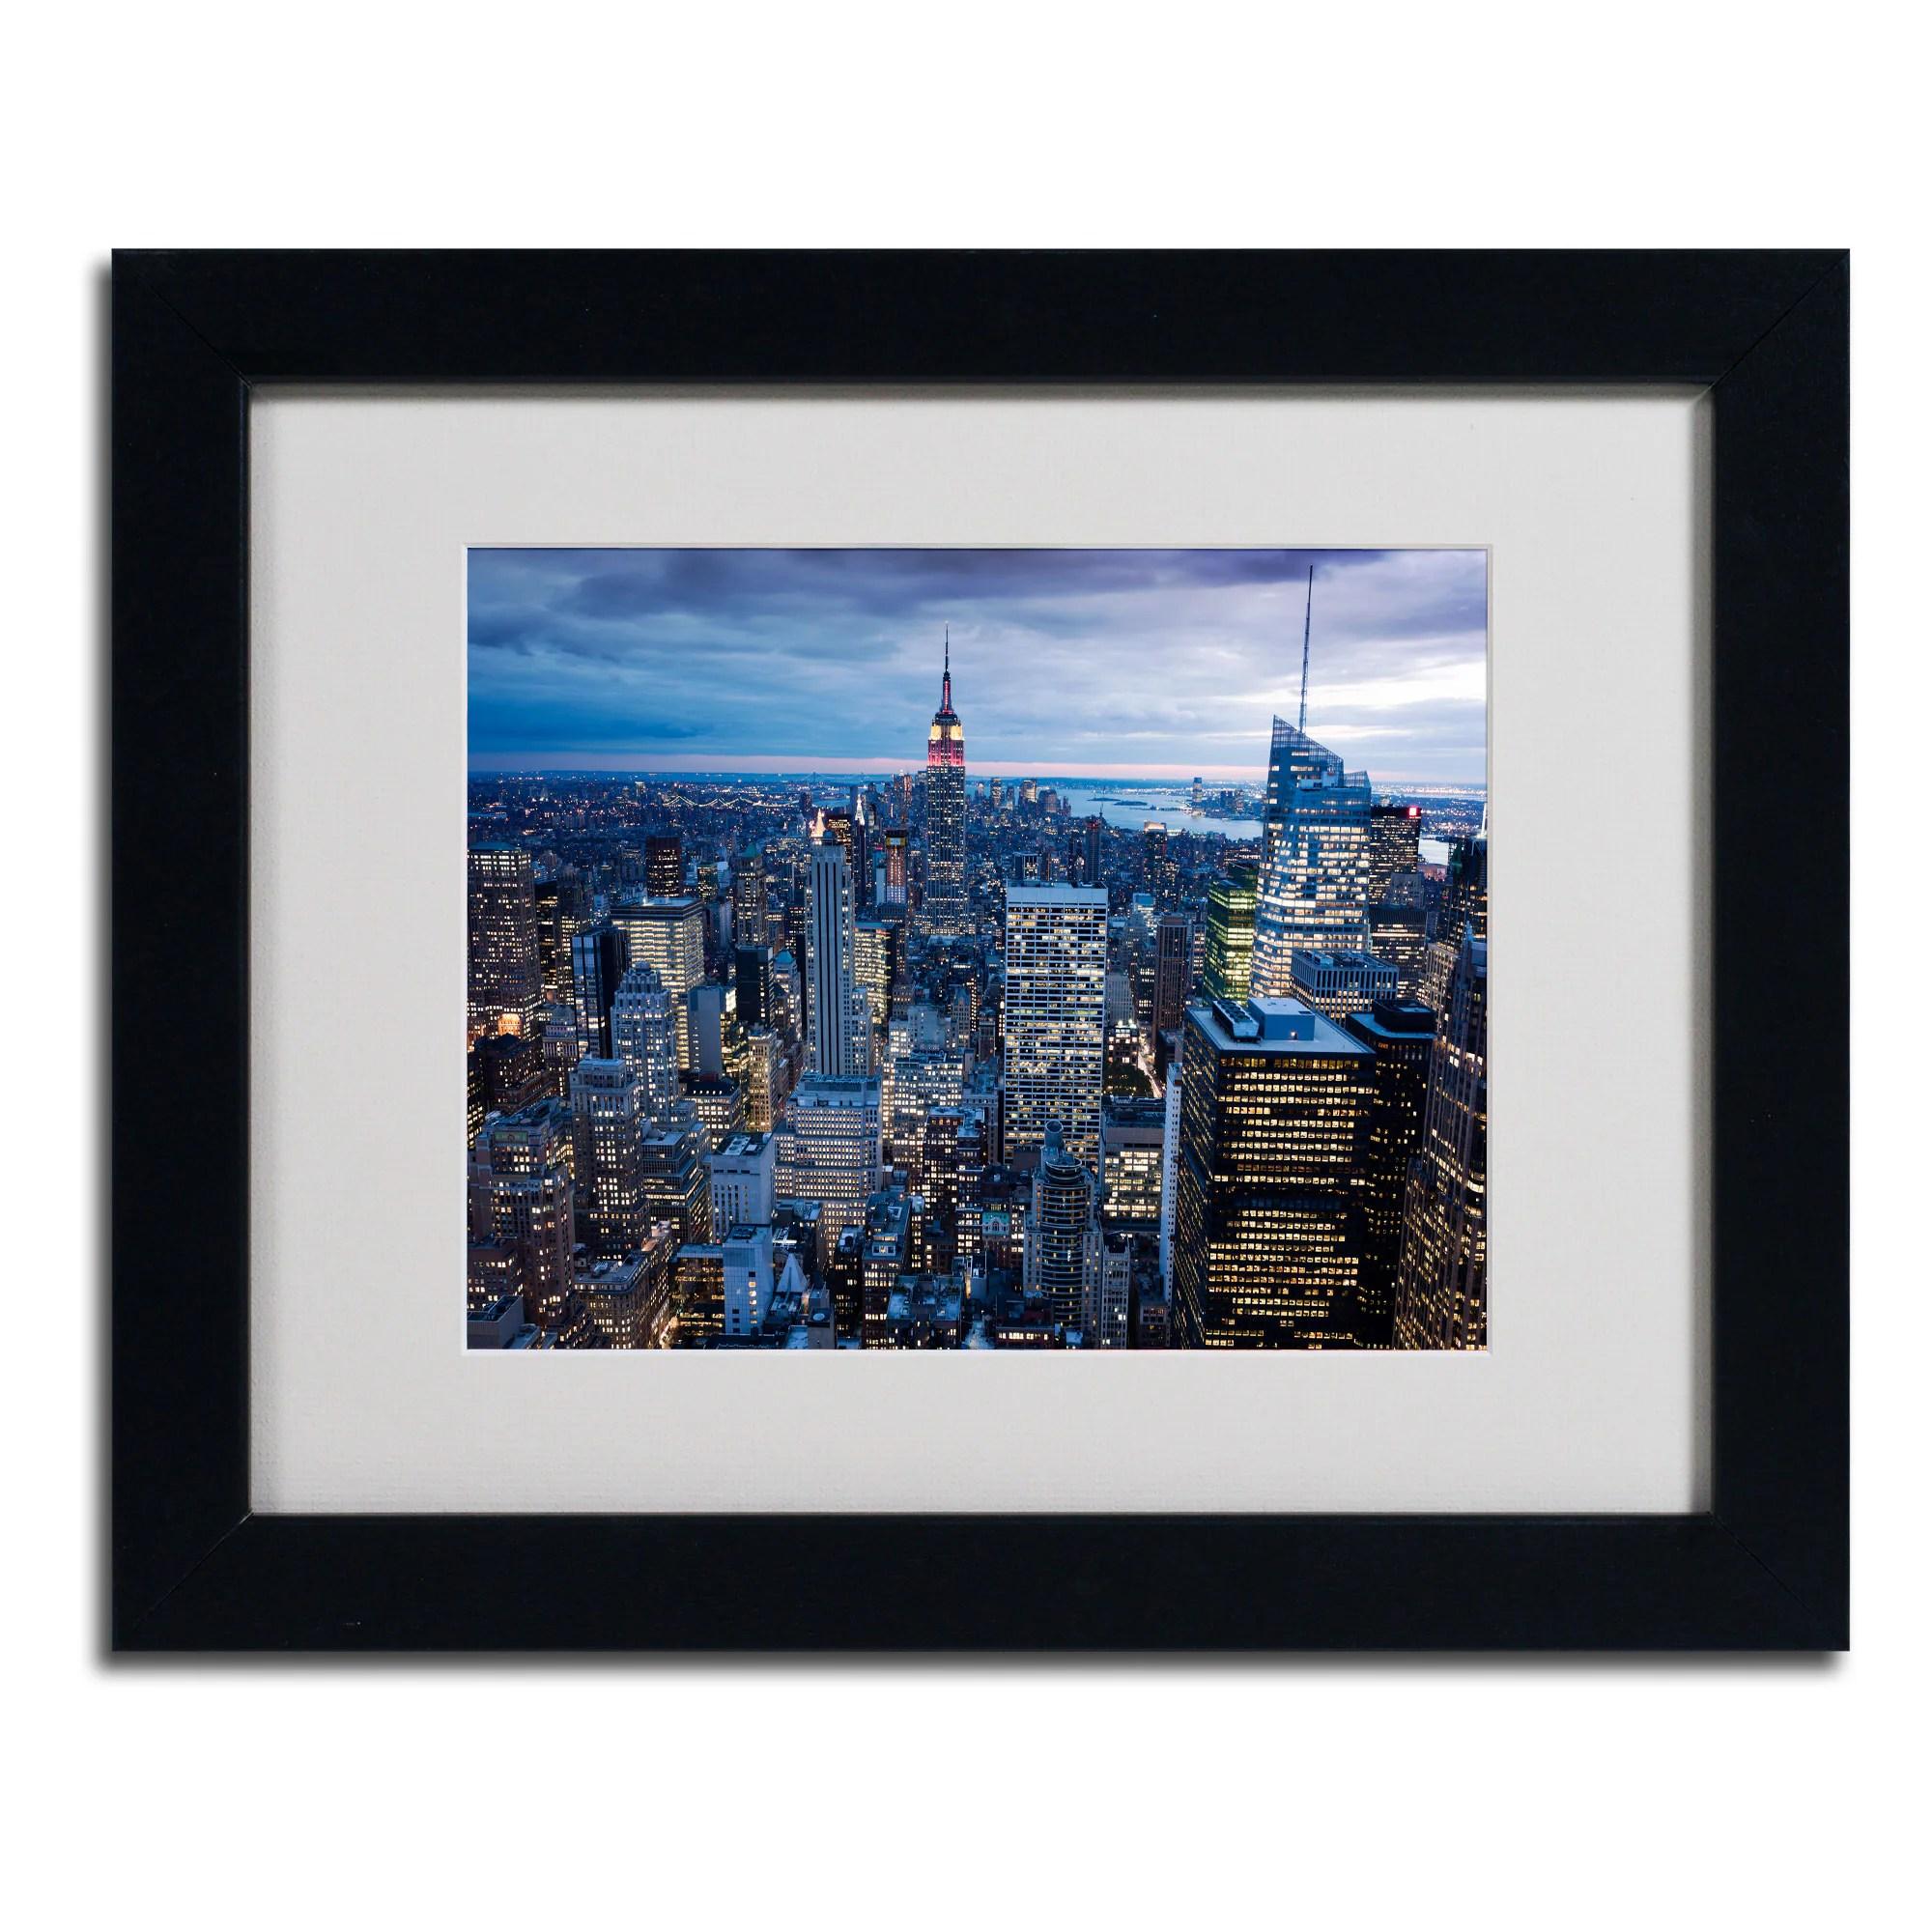 Yakov Agani 'New York City, NY' Framed Matted Art